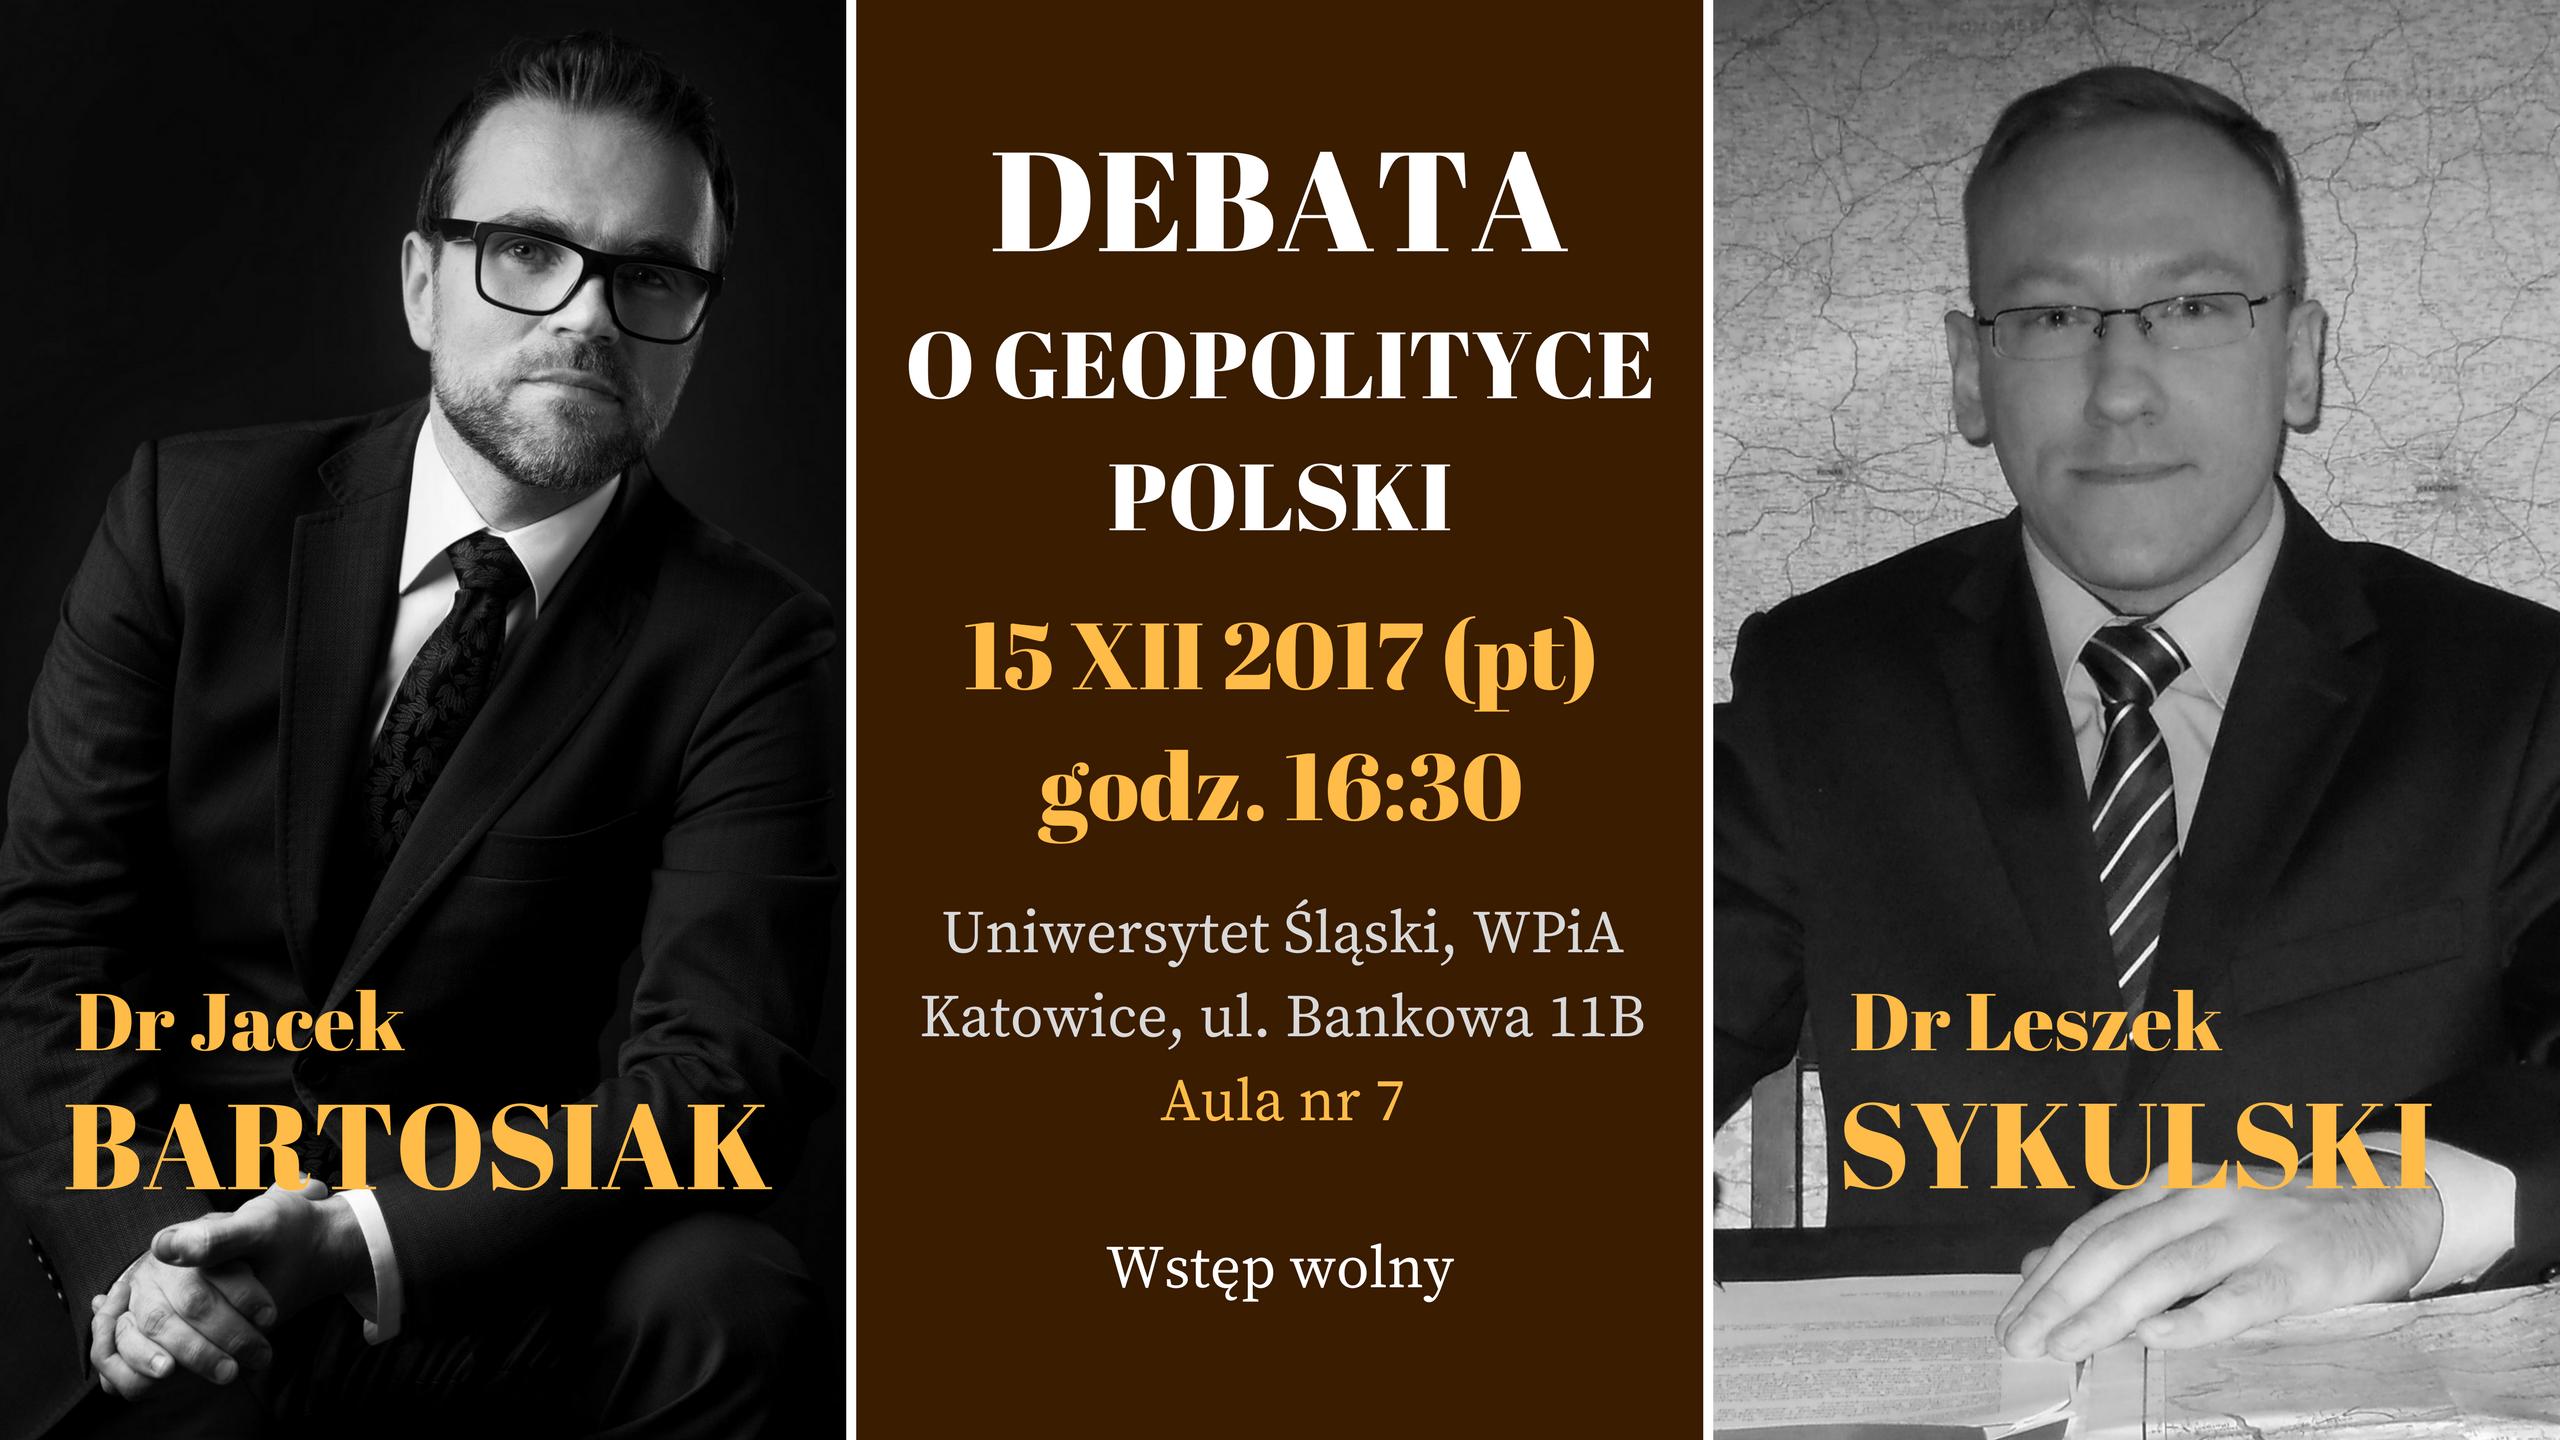 Bartosiak_Sykulski_Debata_baner